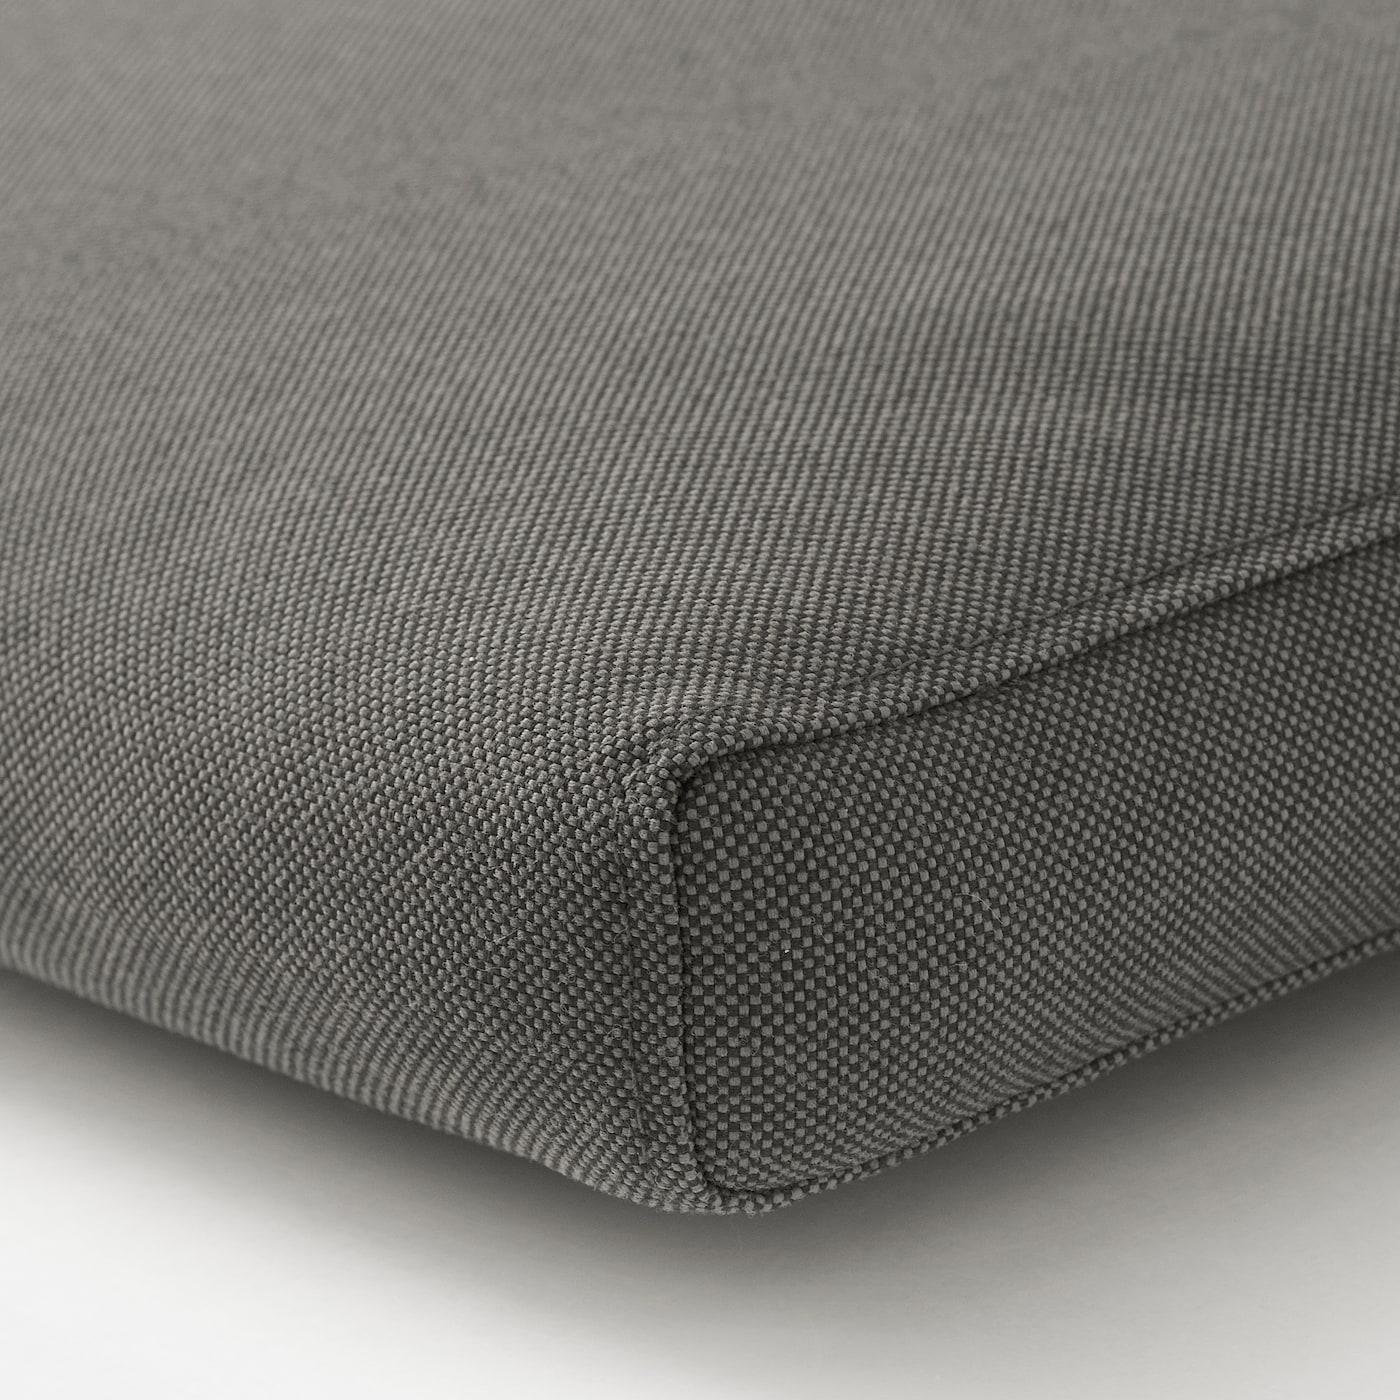 FRÖSÖN/DUVHOLMEN Stolpute, utendørs, mørk grå, 44x44 cm